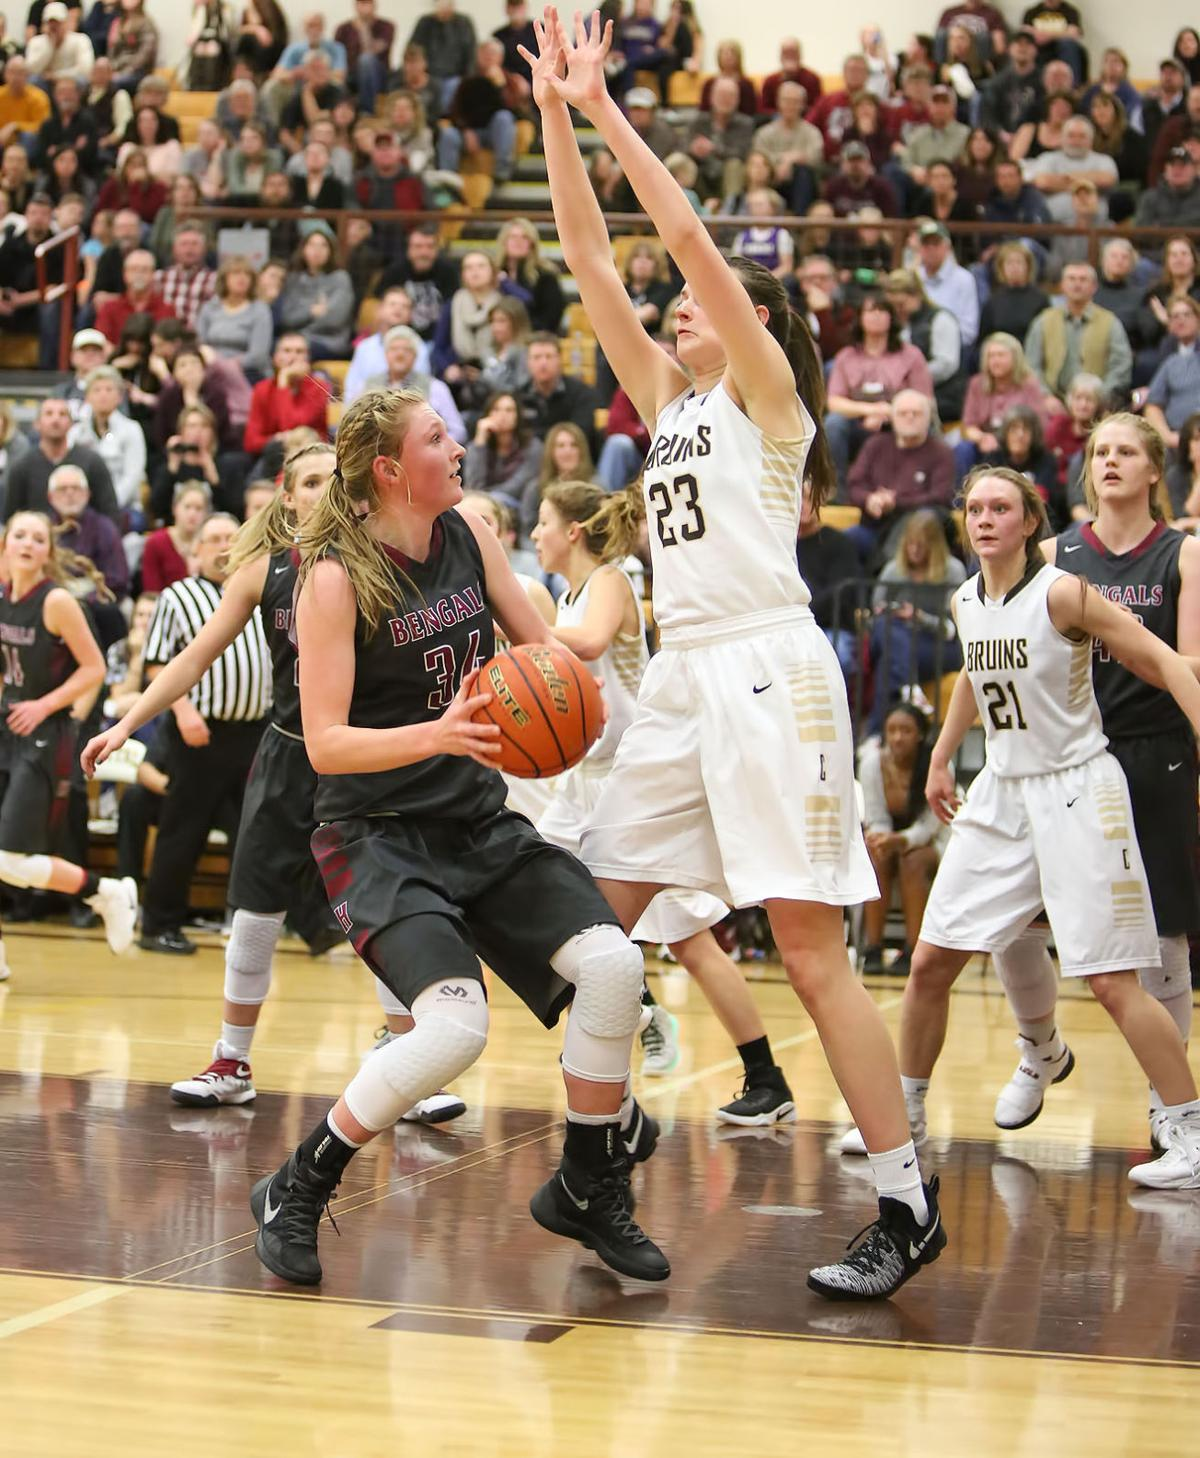 girls basketball; HHS vs CHS (copy)